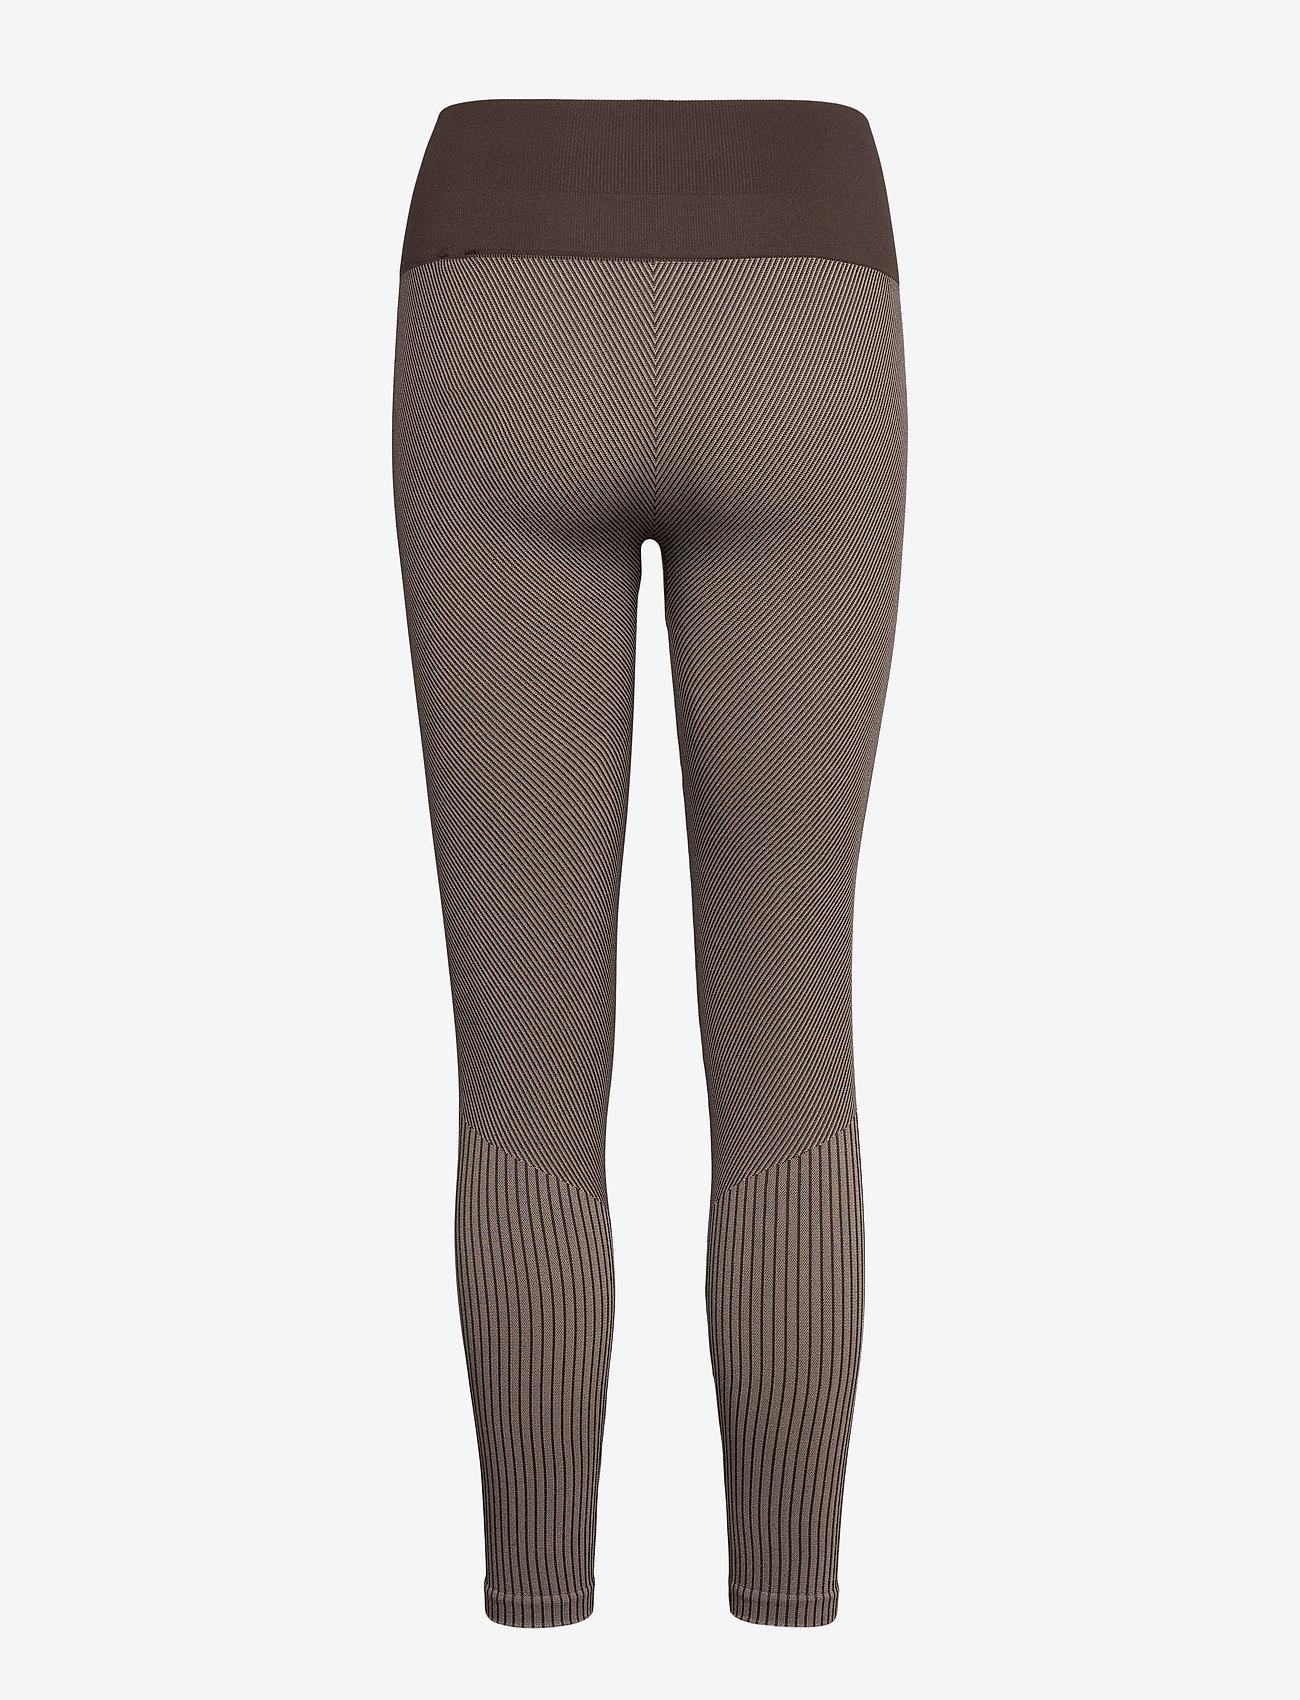 Casall - Seamless tights - running & training tights - berlin brown - 1